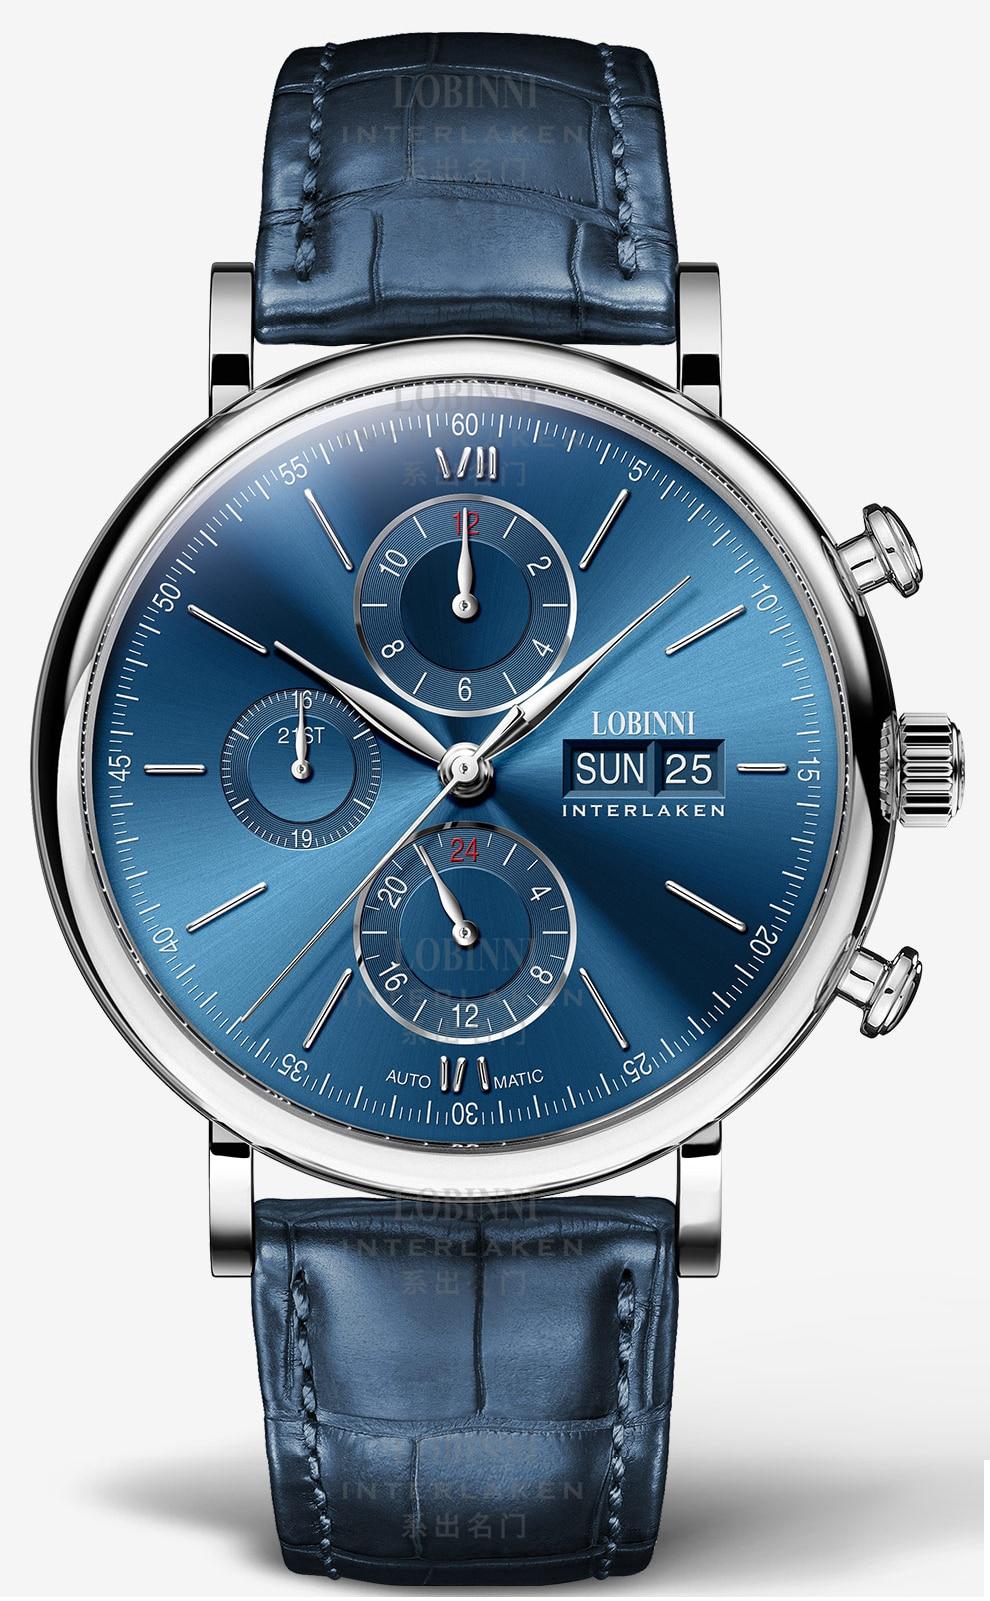 HTB1IznhVcfpK1RjSZFOq6y6nFXa2 Switzerland LOBINNI Men Watches Luxury Brand Perpetual Calender Auto Mechanical Men's Clock Sapphire Leather relogio L13019-6